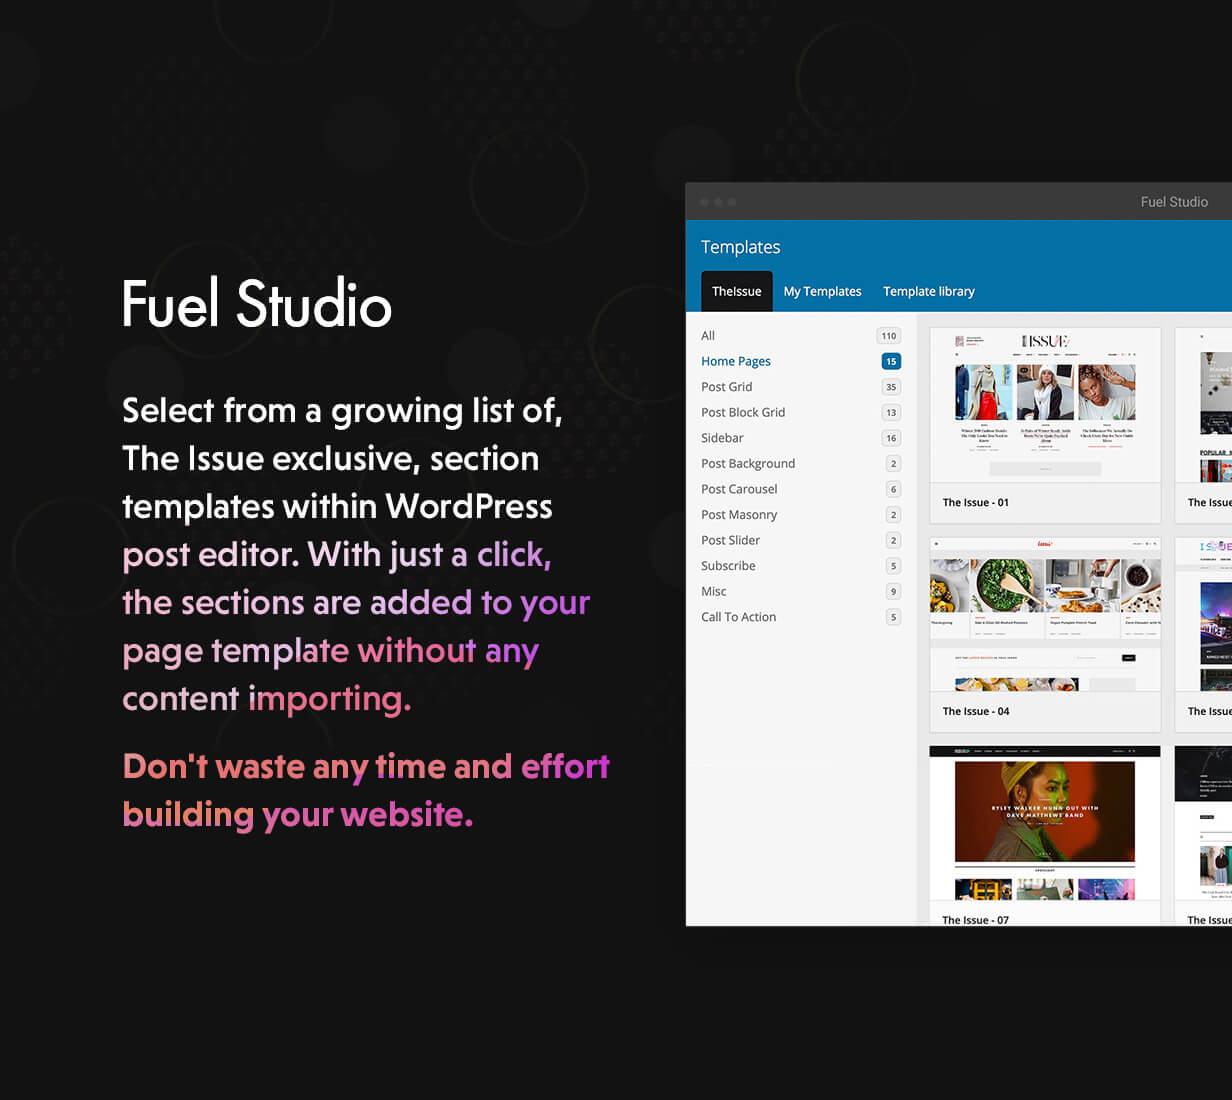 02 - The Issue - Versatile Magazine WordPress Theme